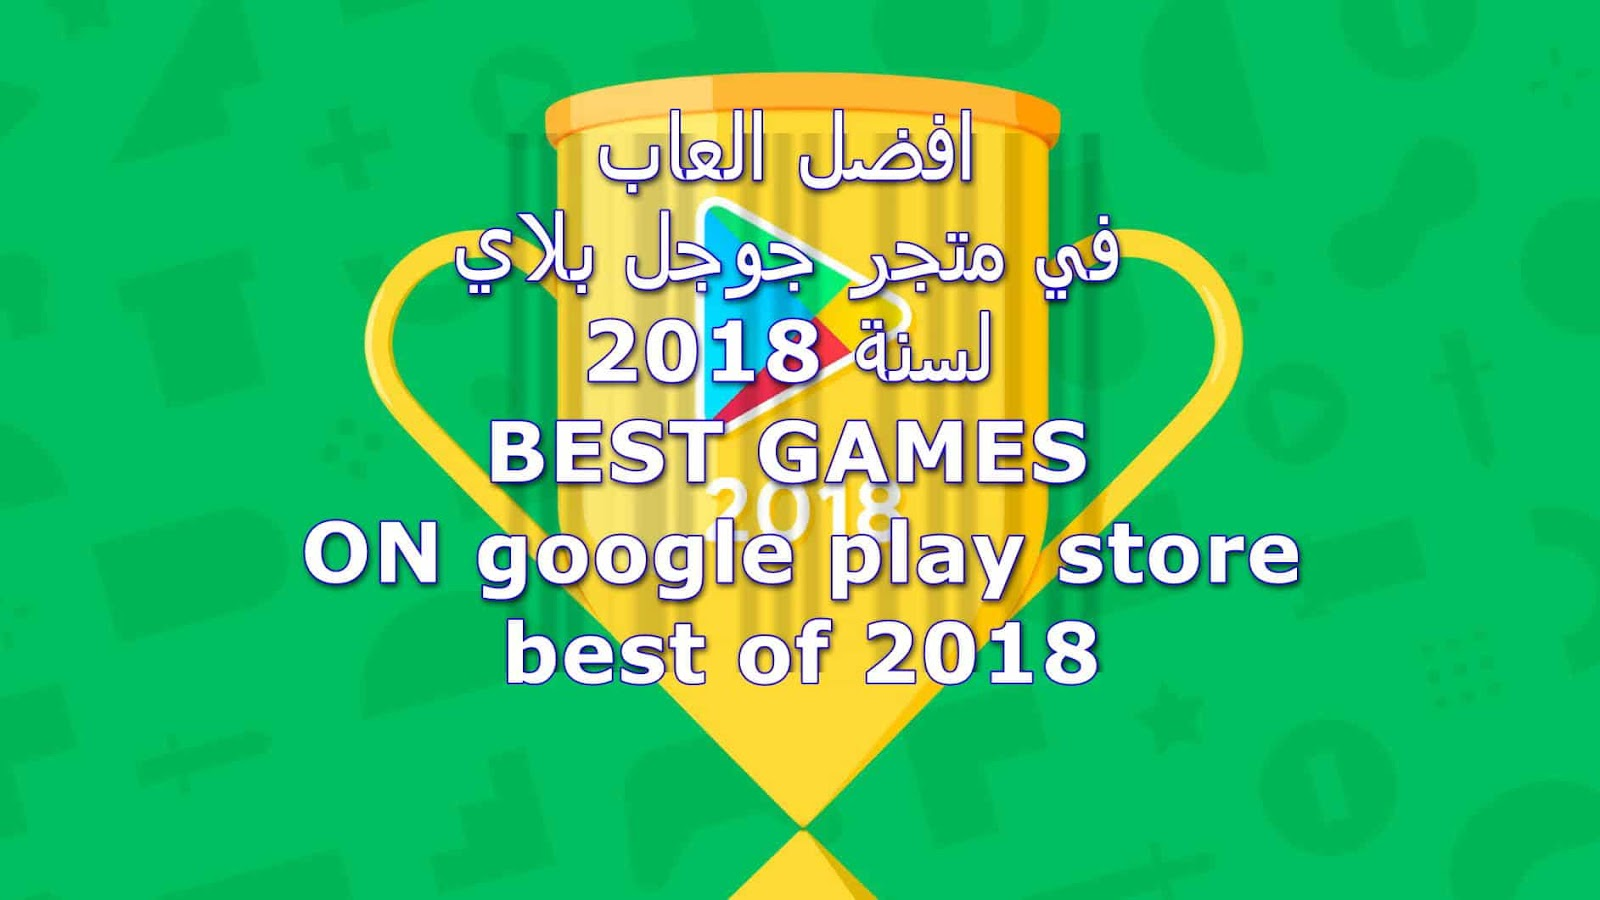 800aa433f افضل العاب في متجر جوجل بلاي لسنة 2018 - يمن تك